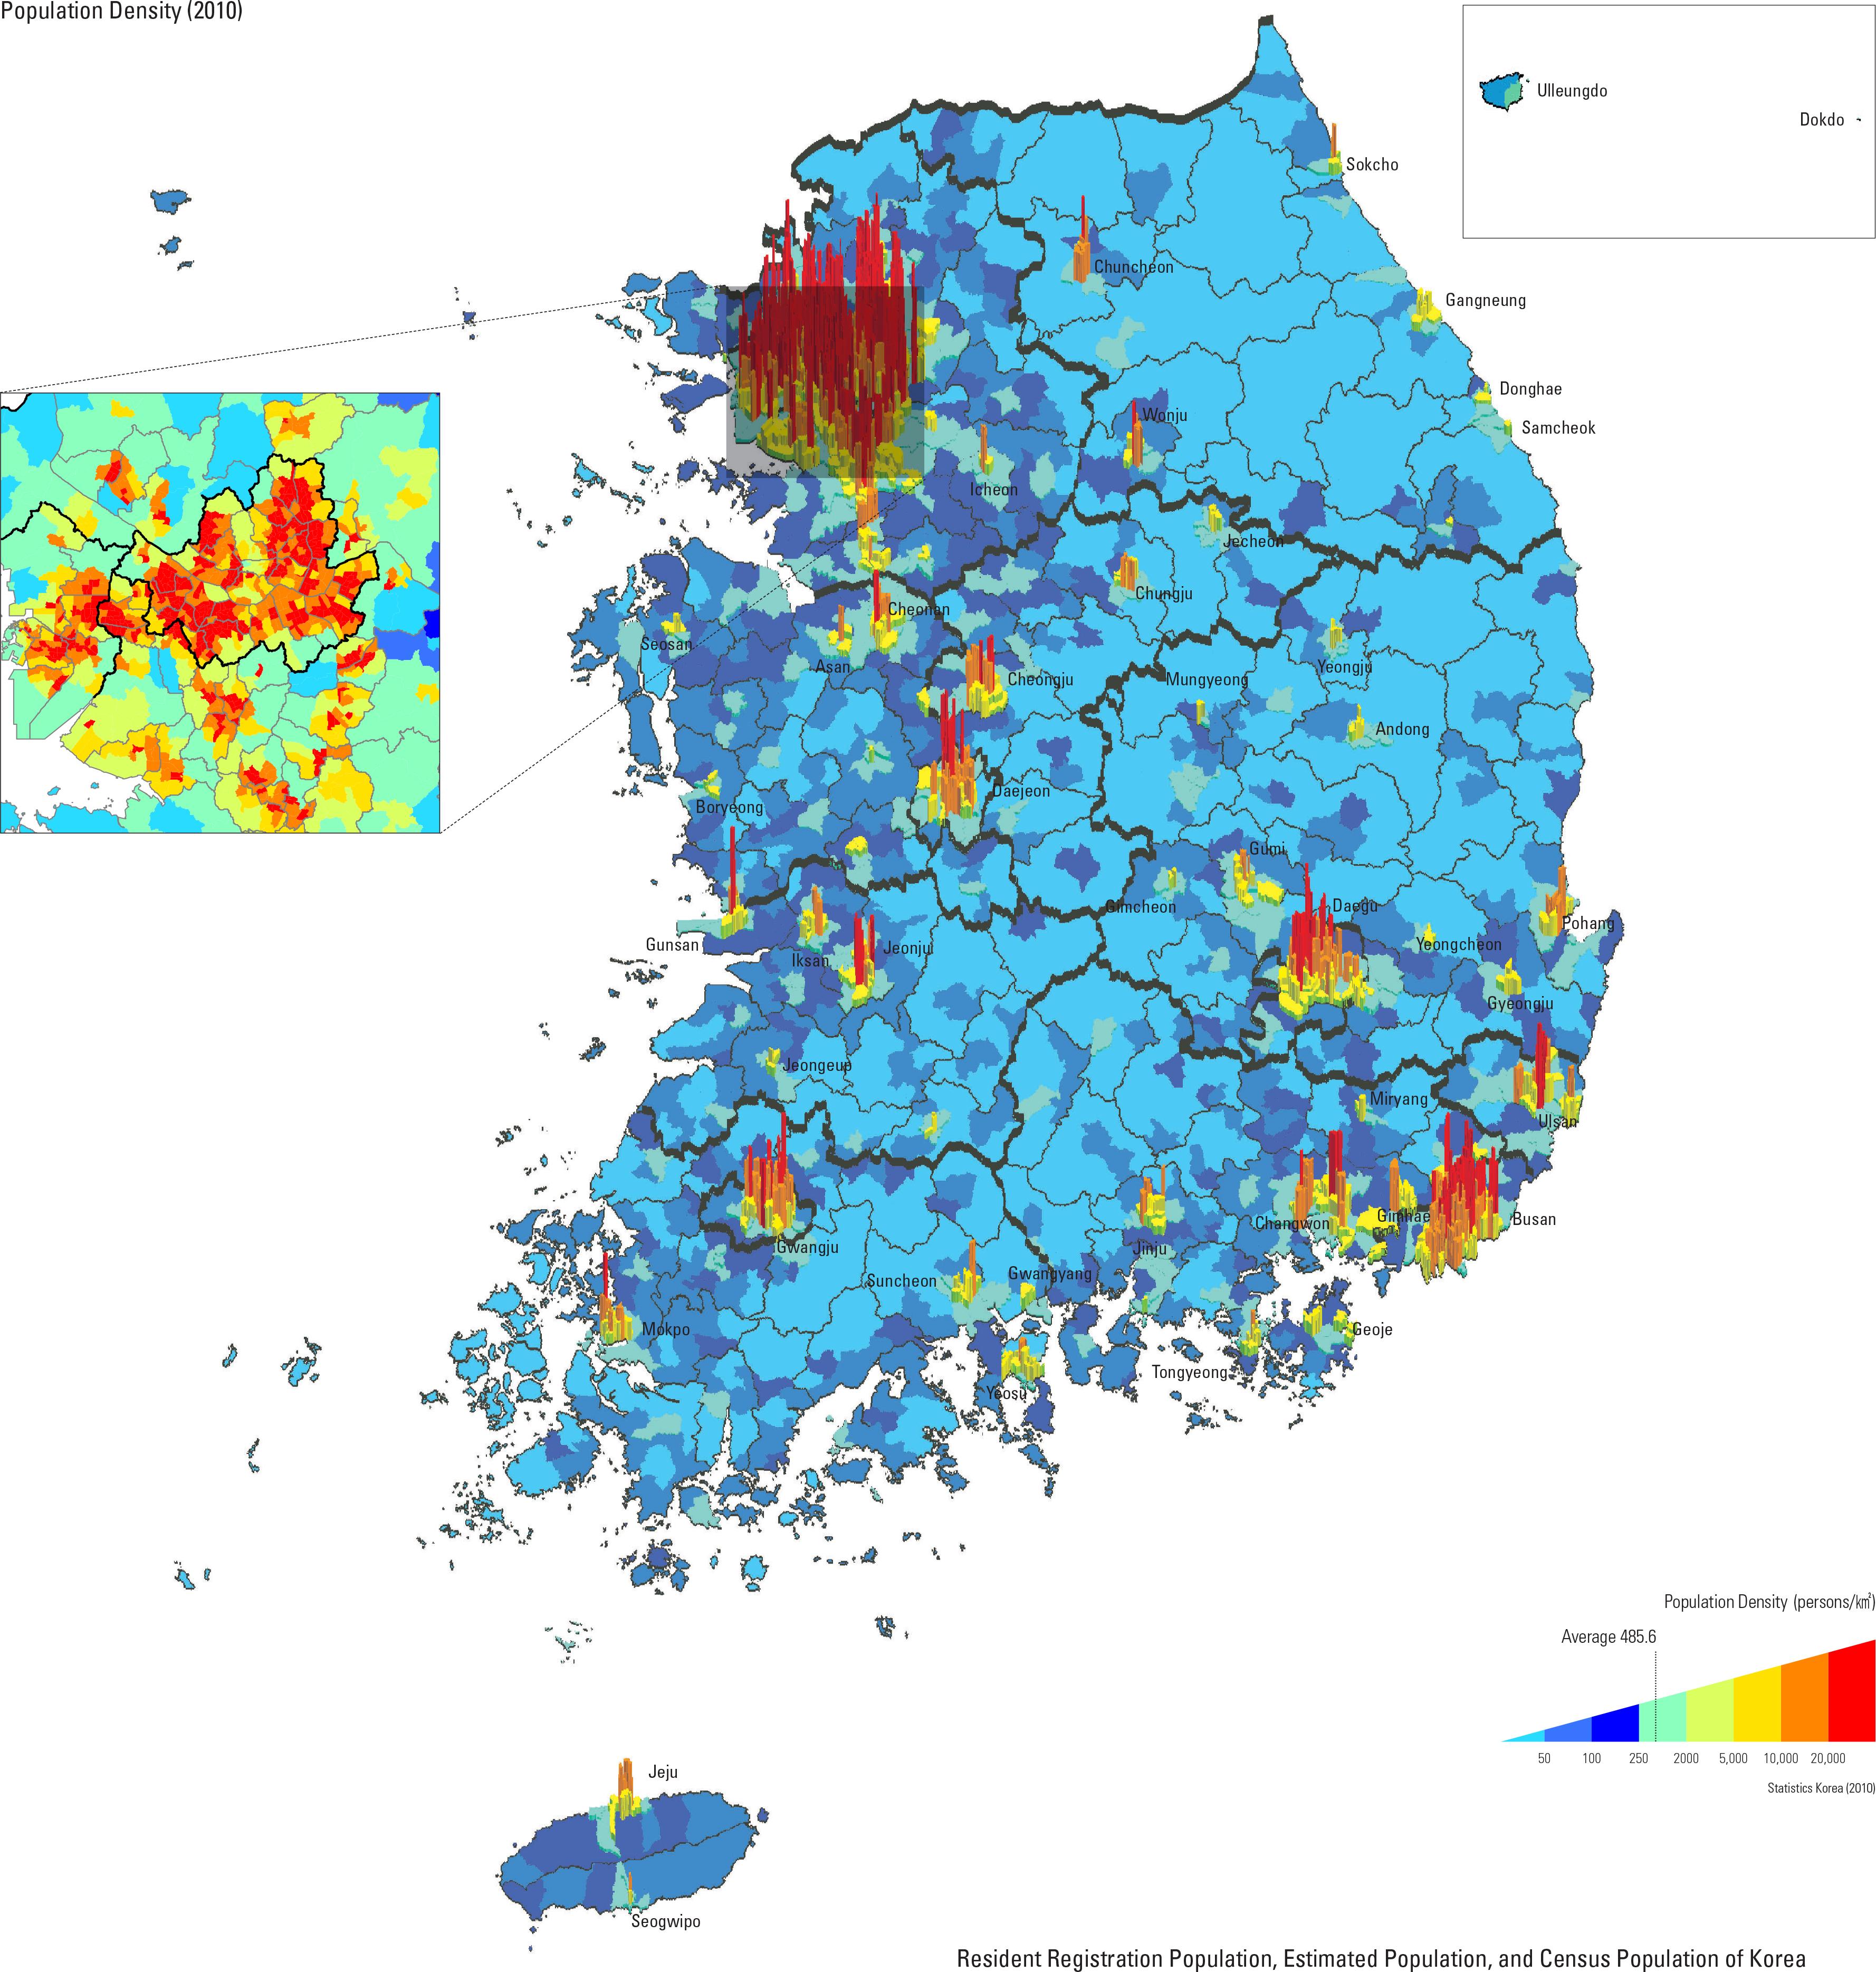 Population Density (2010)